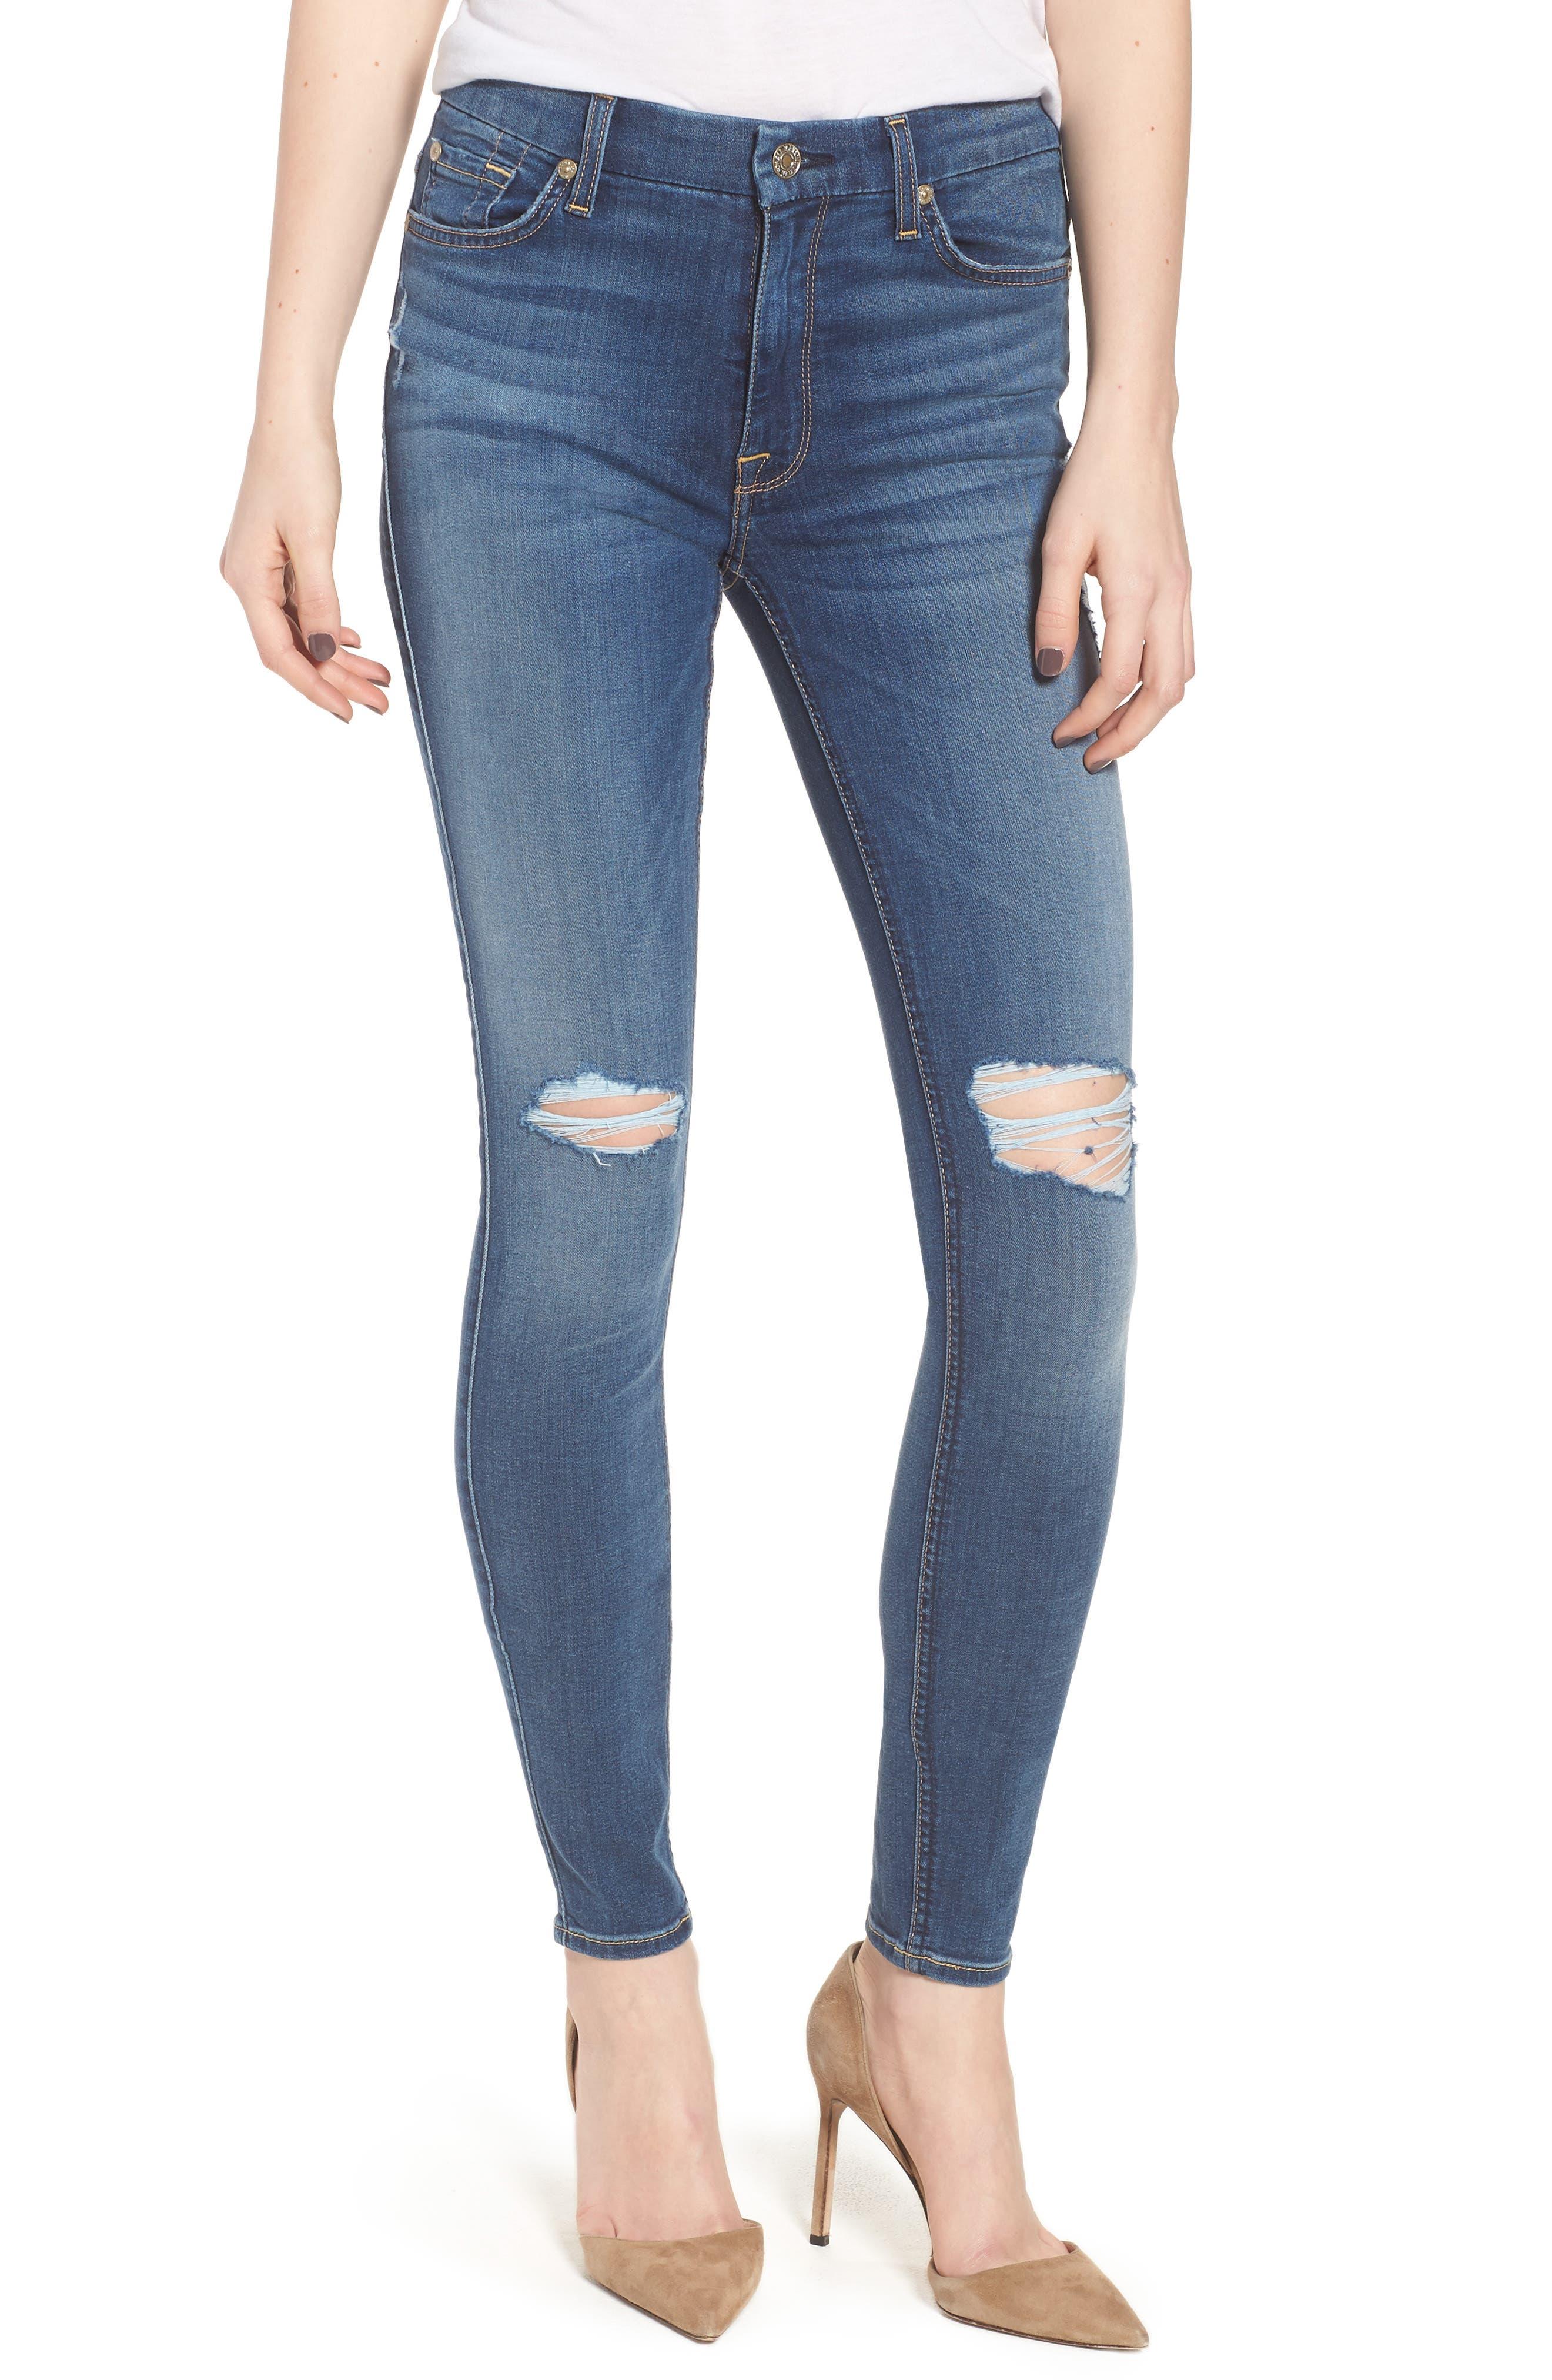 'b(air) - The Ankle' Skinny Jeans,                         Main,                         color, Bair Vintage Dusk 2